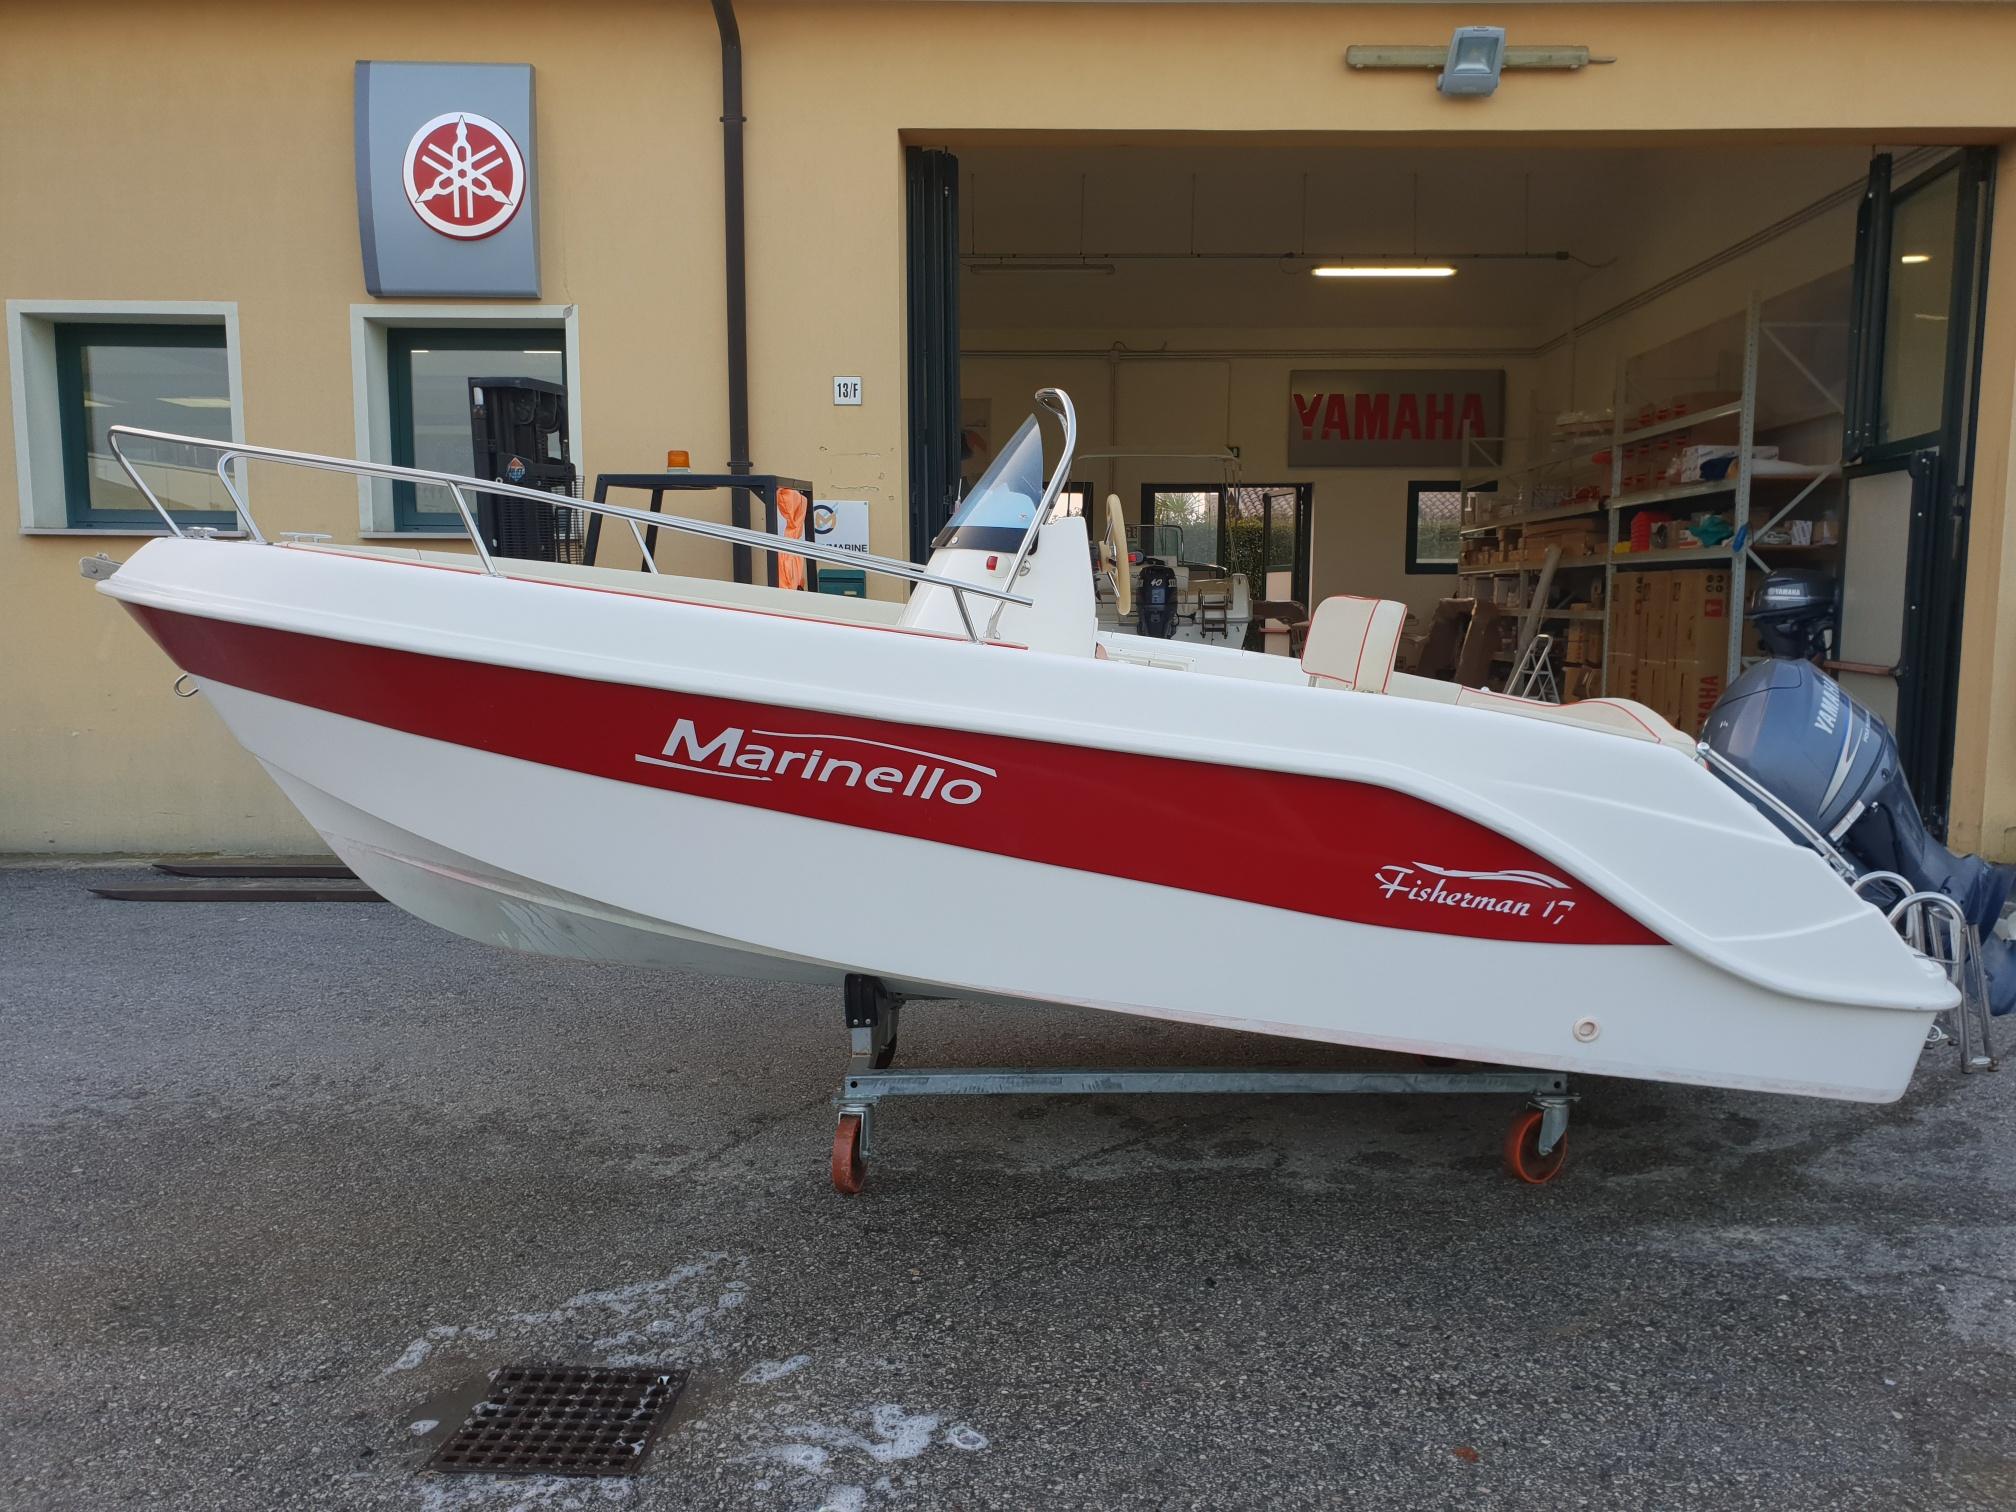 Foto Occasione Open Marinello 17 Fisherman + Yamaha F 40/60 - 5